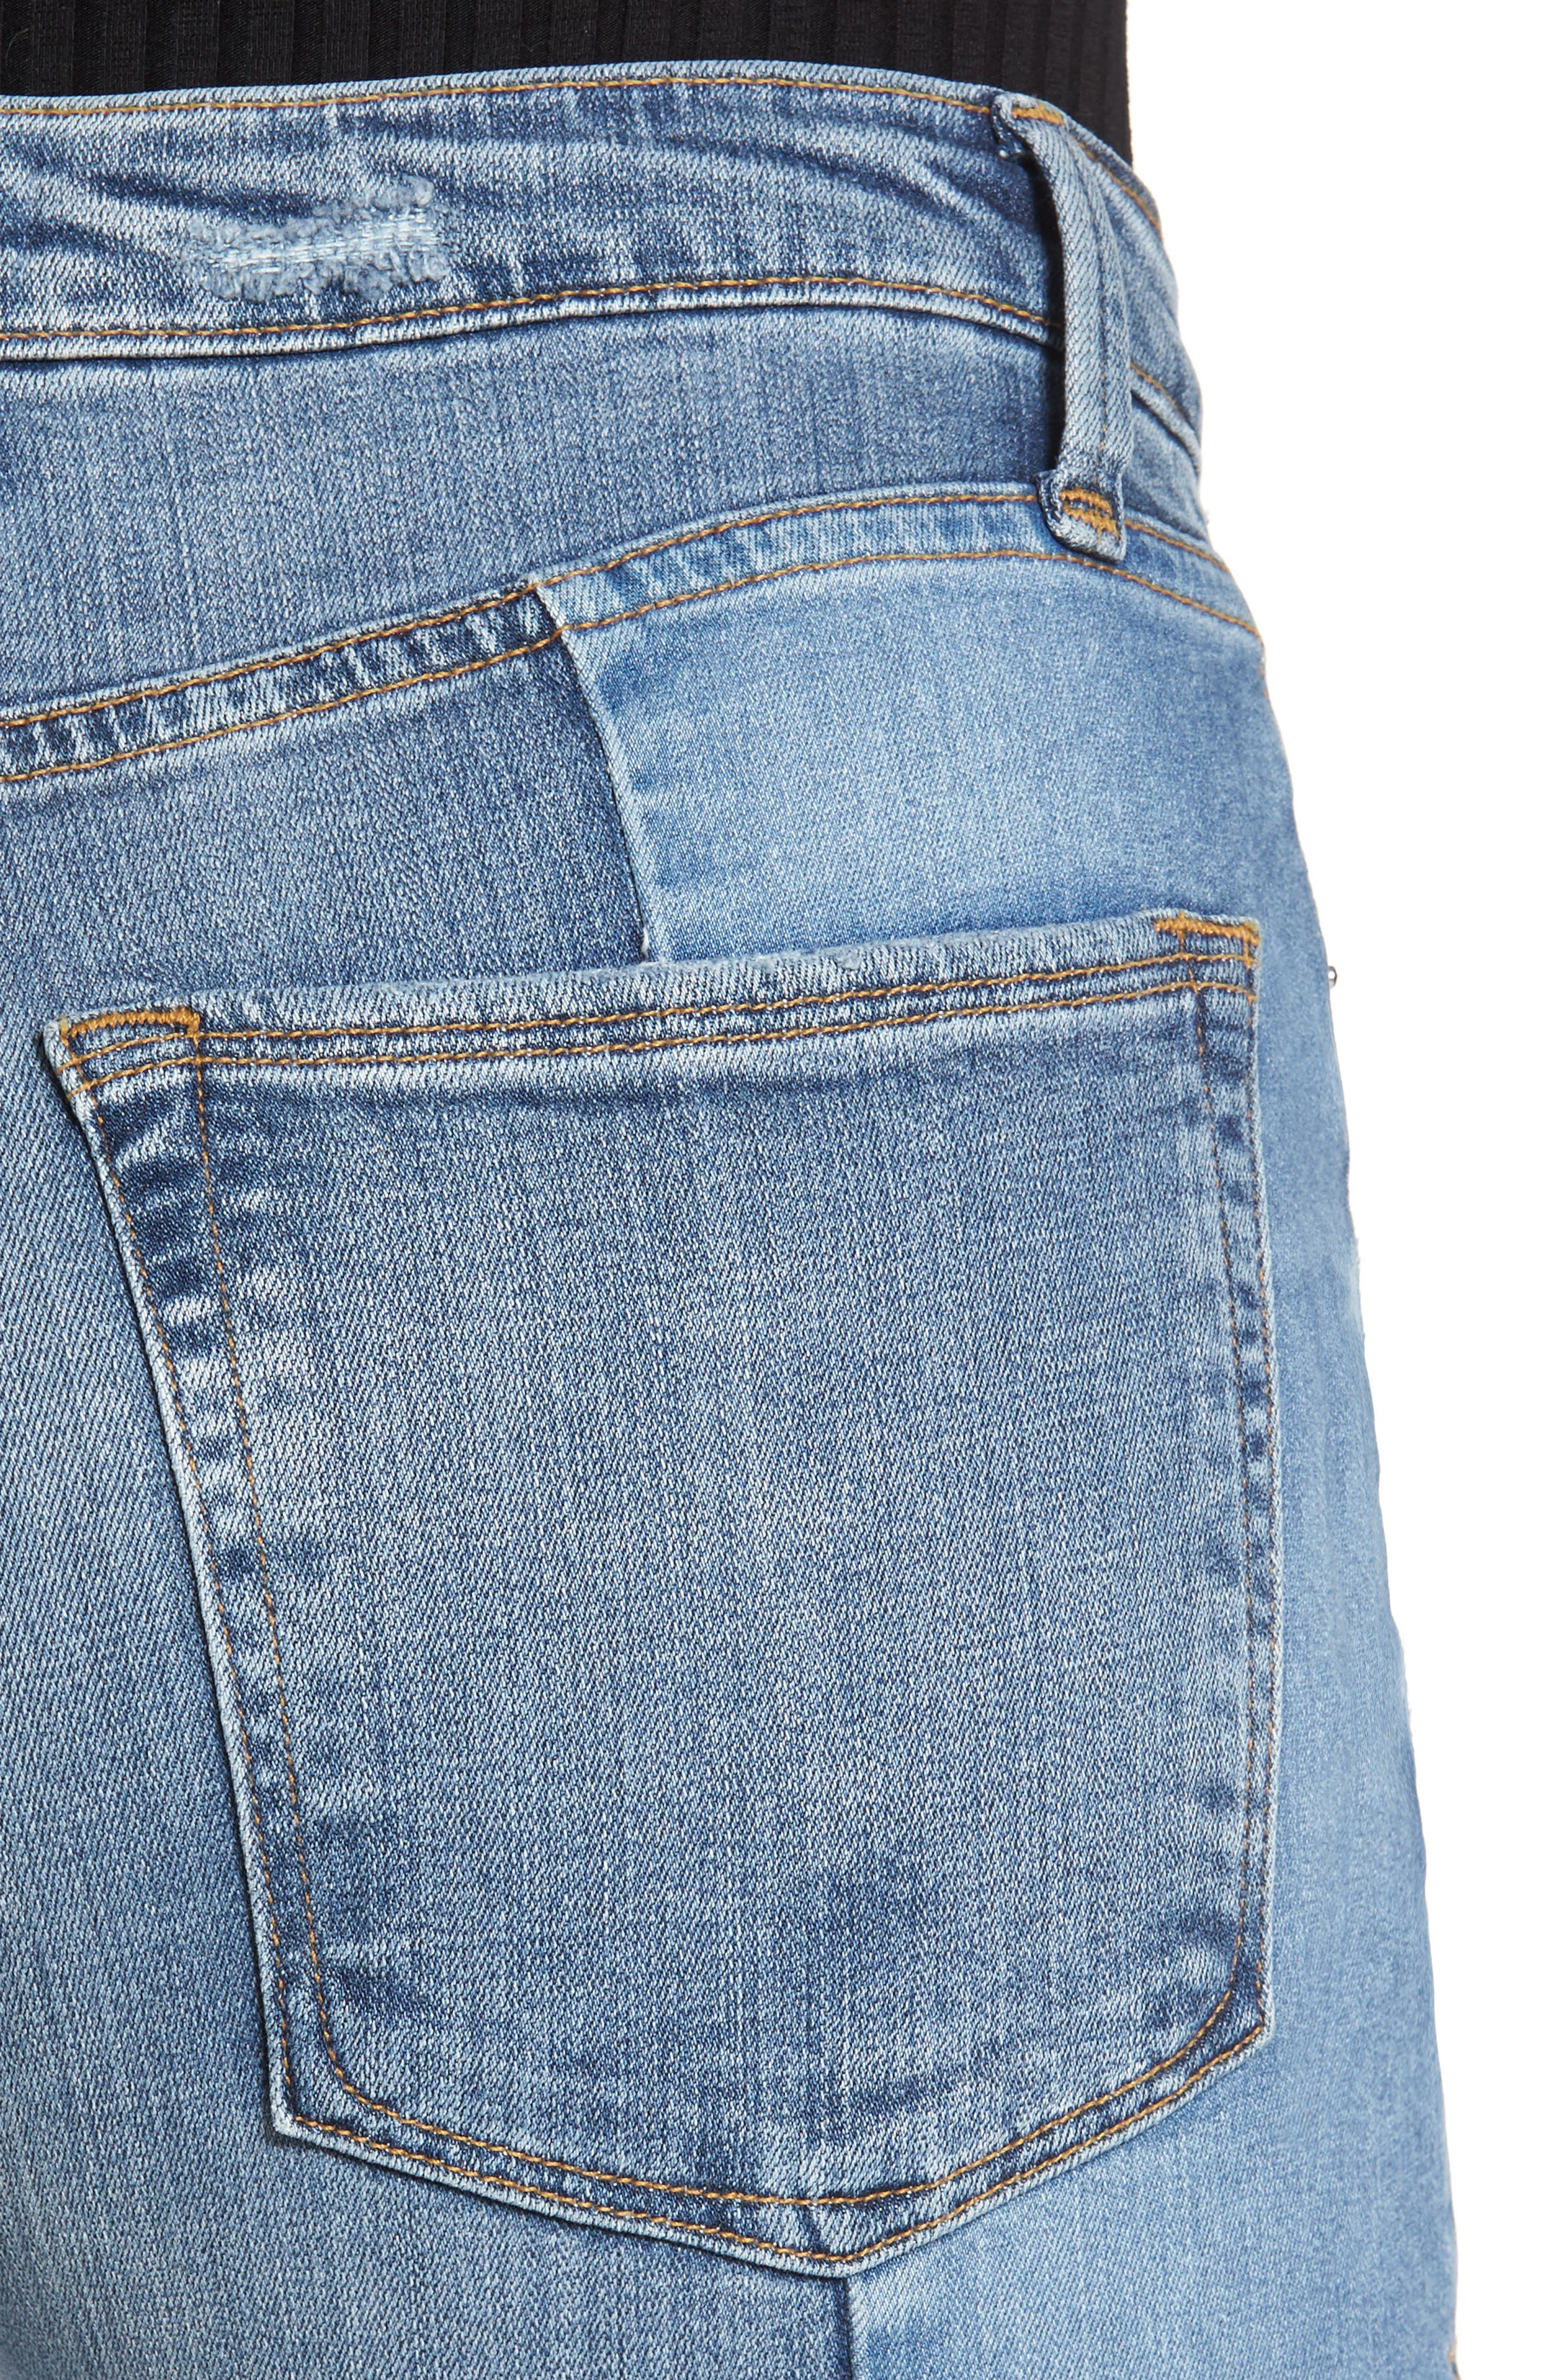 Alternate Image 4  - Good American Raw Hem High Waist Skinny Jeans (Blue 078) (Extended Sizes)